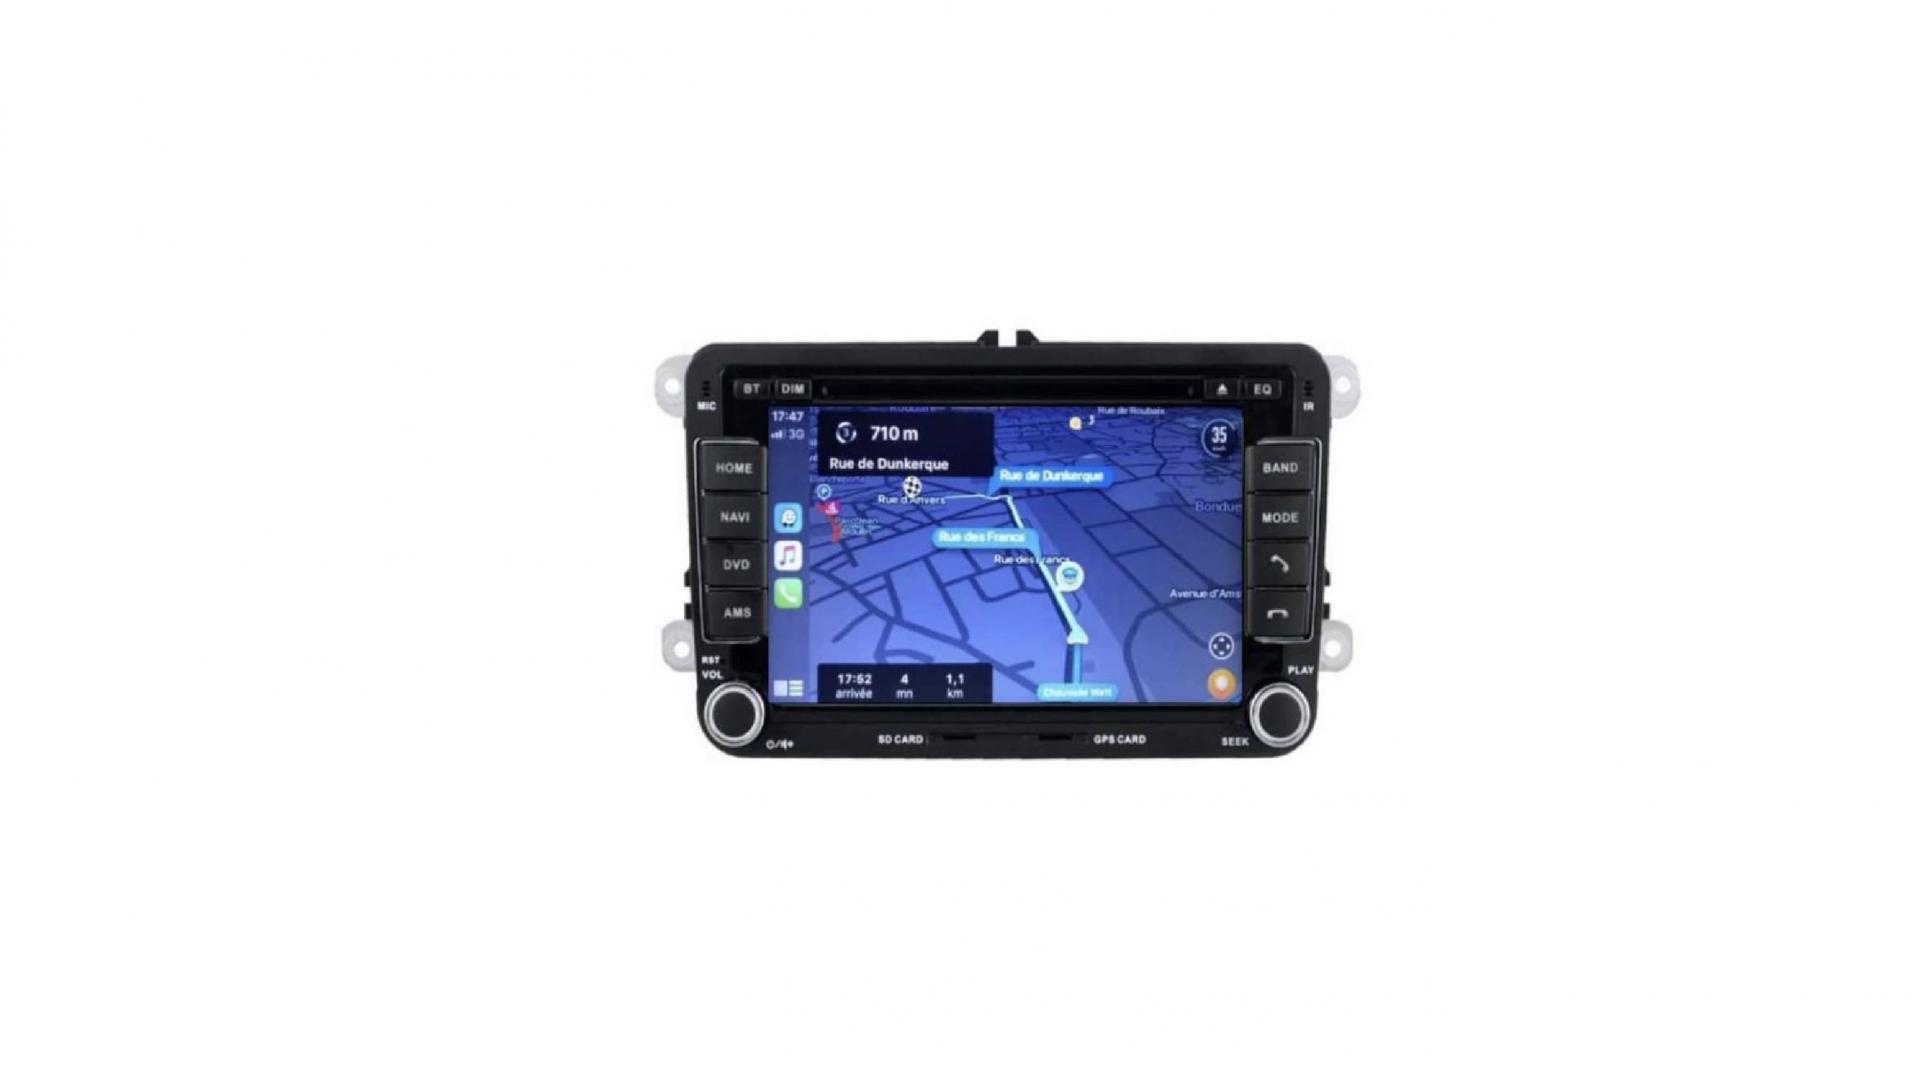 Seat altea toledo alhambra altea xl autoradio gps bluetooth android auto carplay camera de recul commande au volant4 1